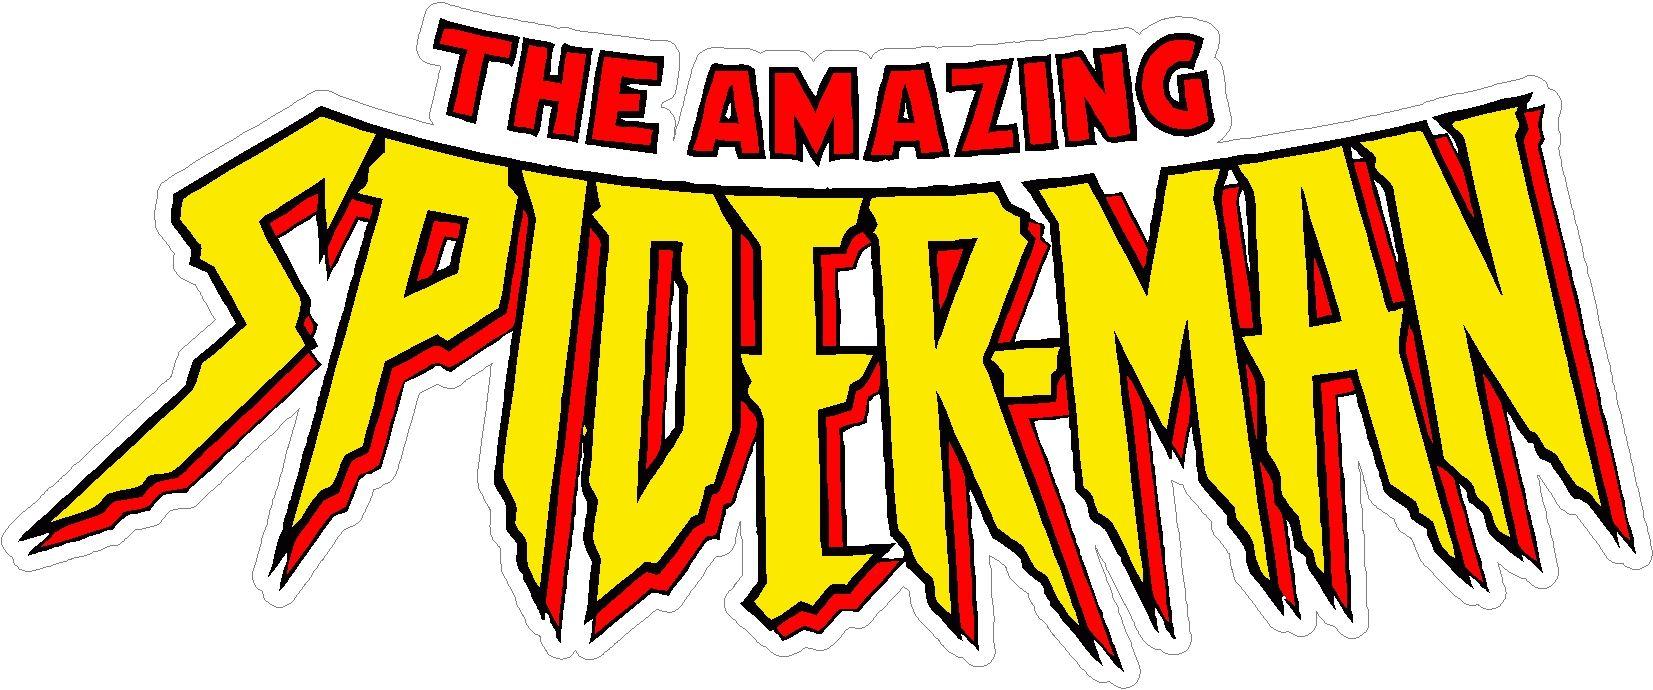 Pin by Lena Lee on .. BOARD BIG IN JAPAN .. Spiderman